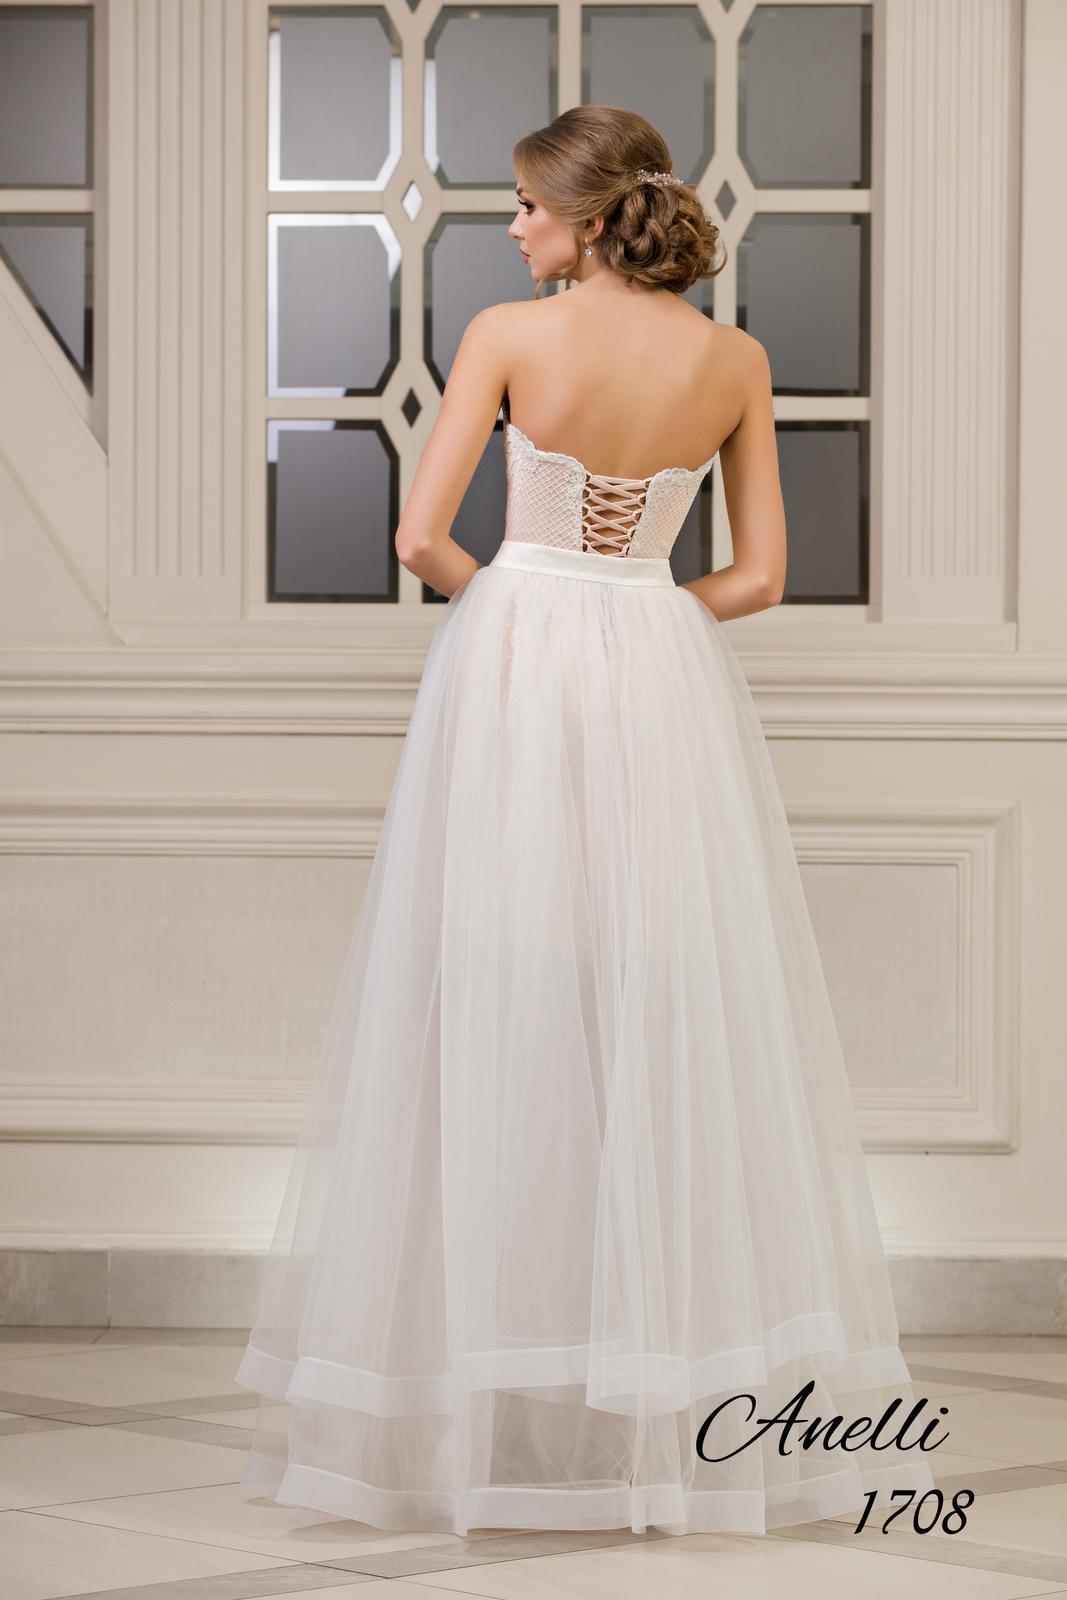 Svadobné šaty - Debut 1708 - Obrázok č. 4